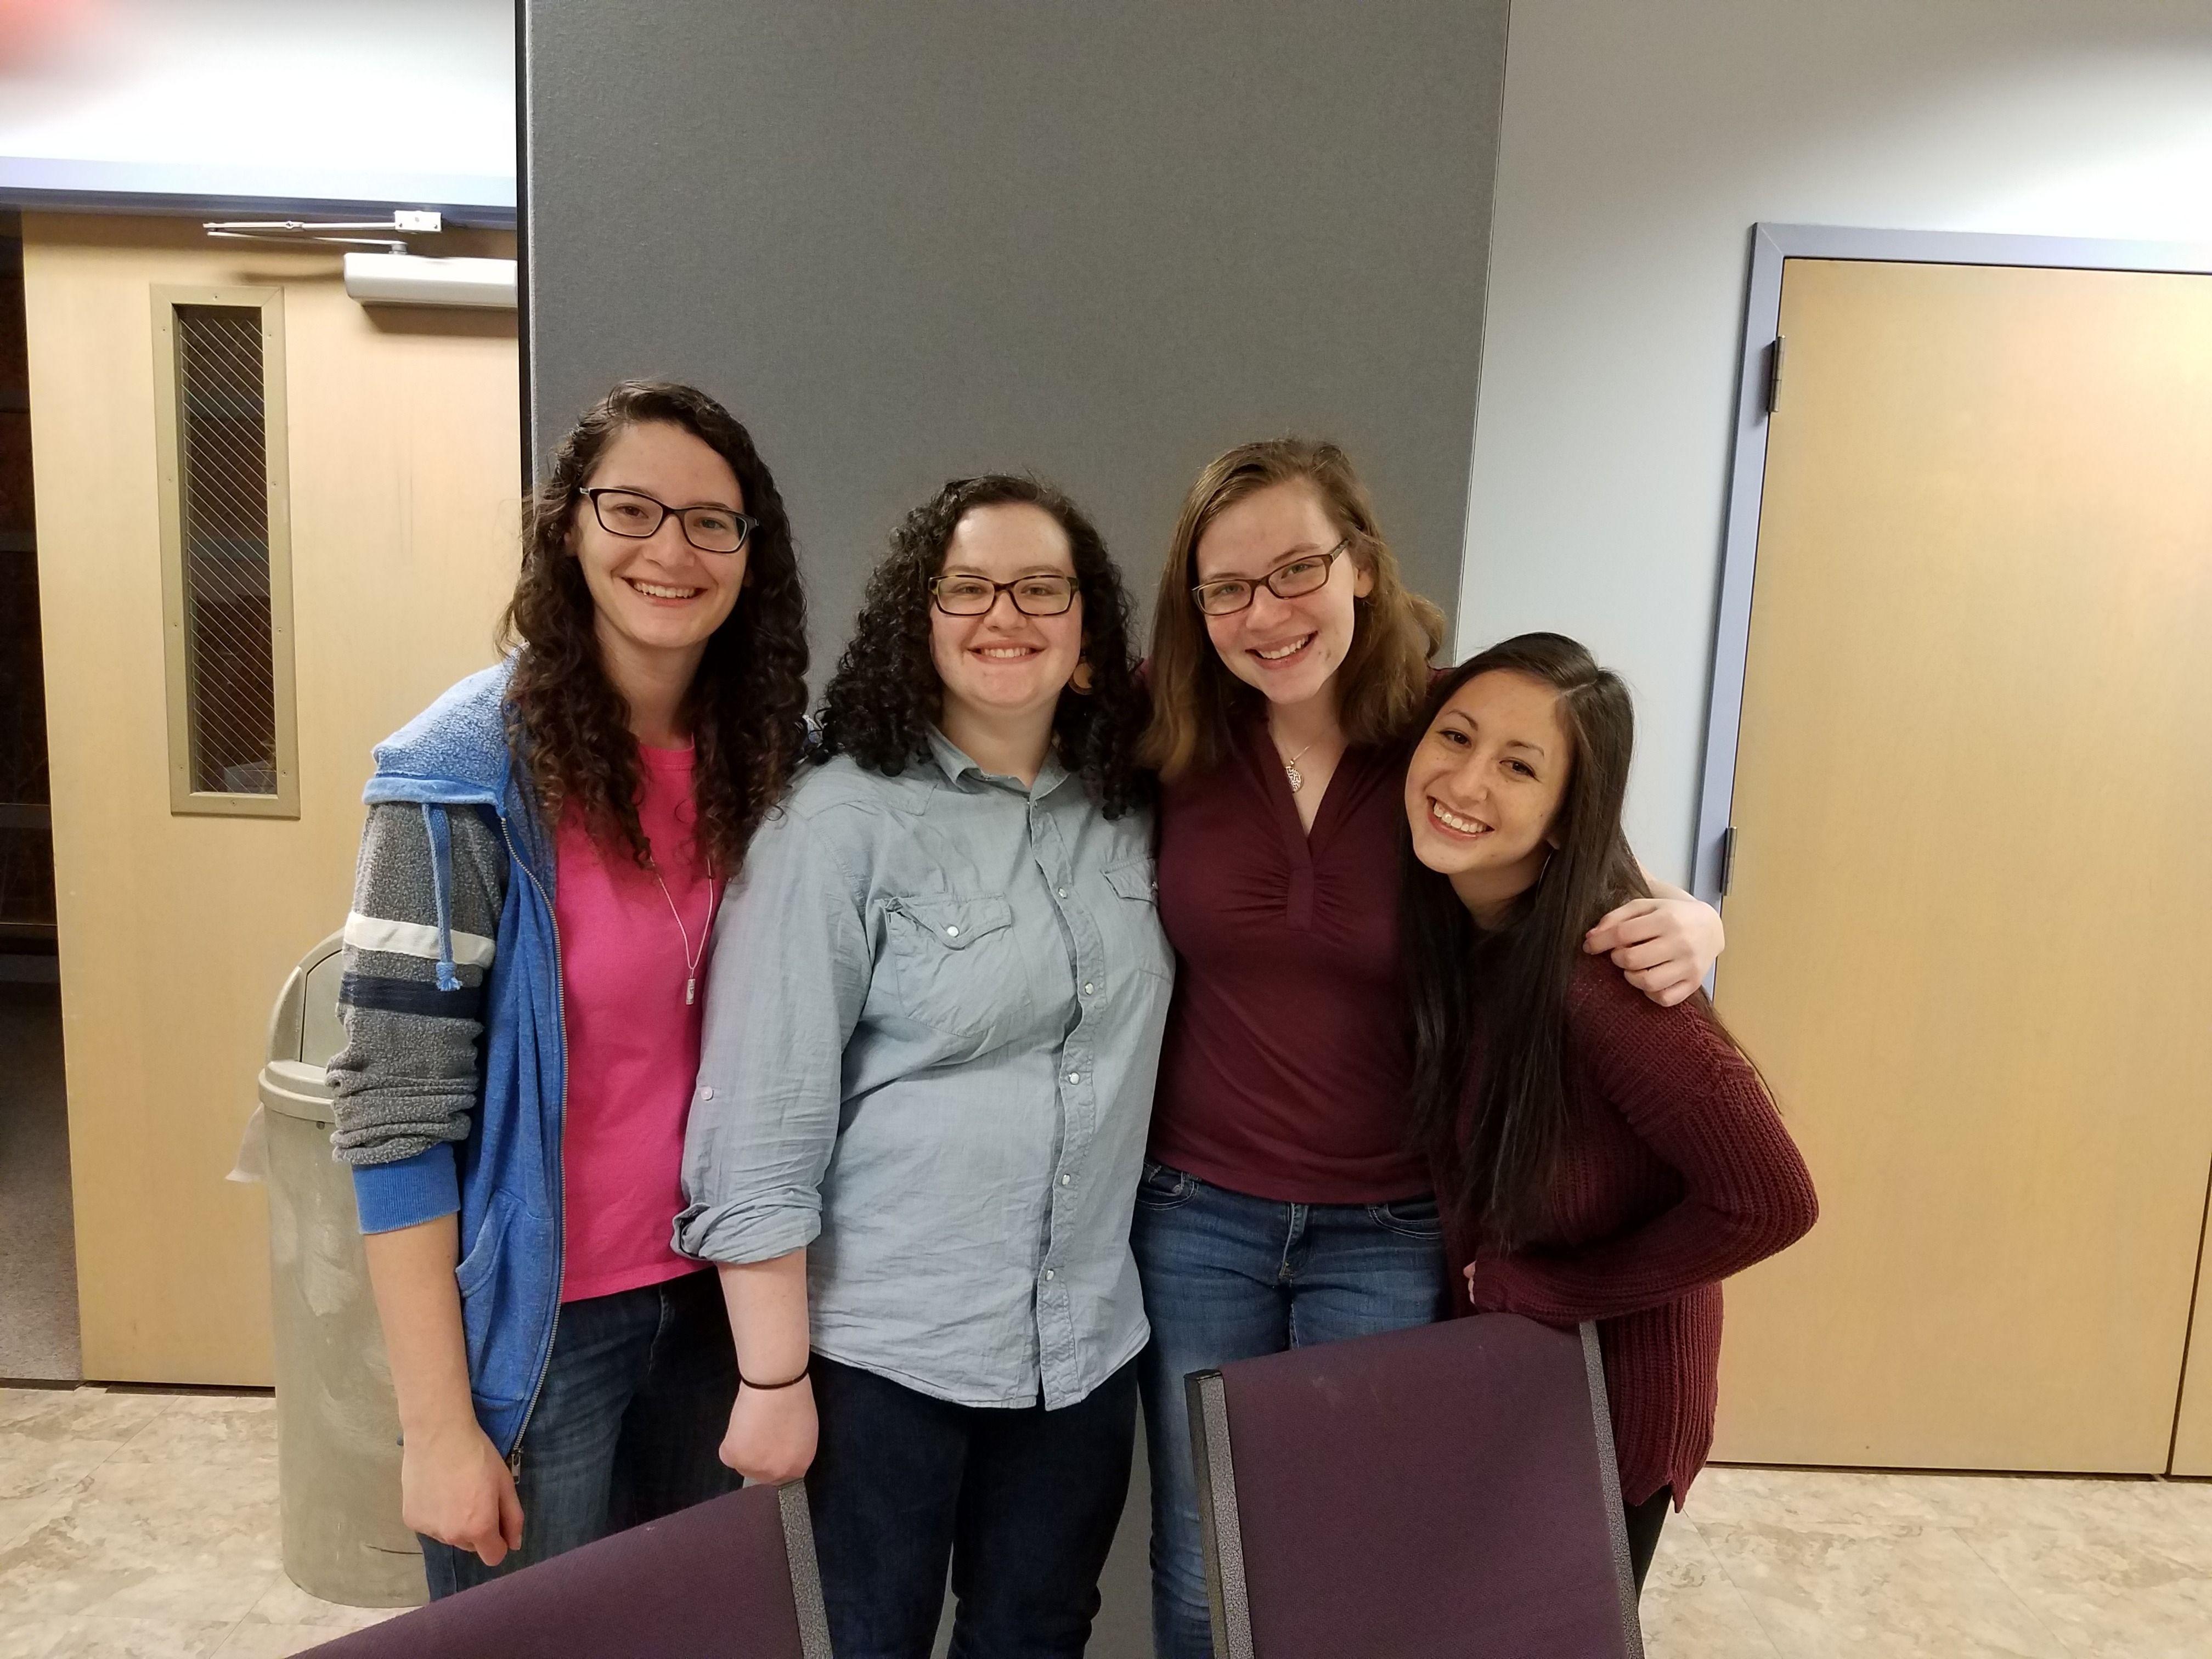 Jewish students at UNC Greensboro